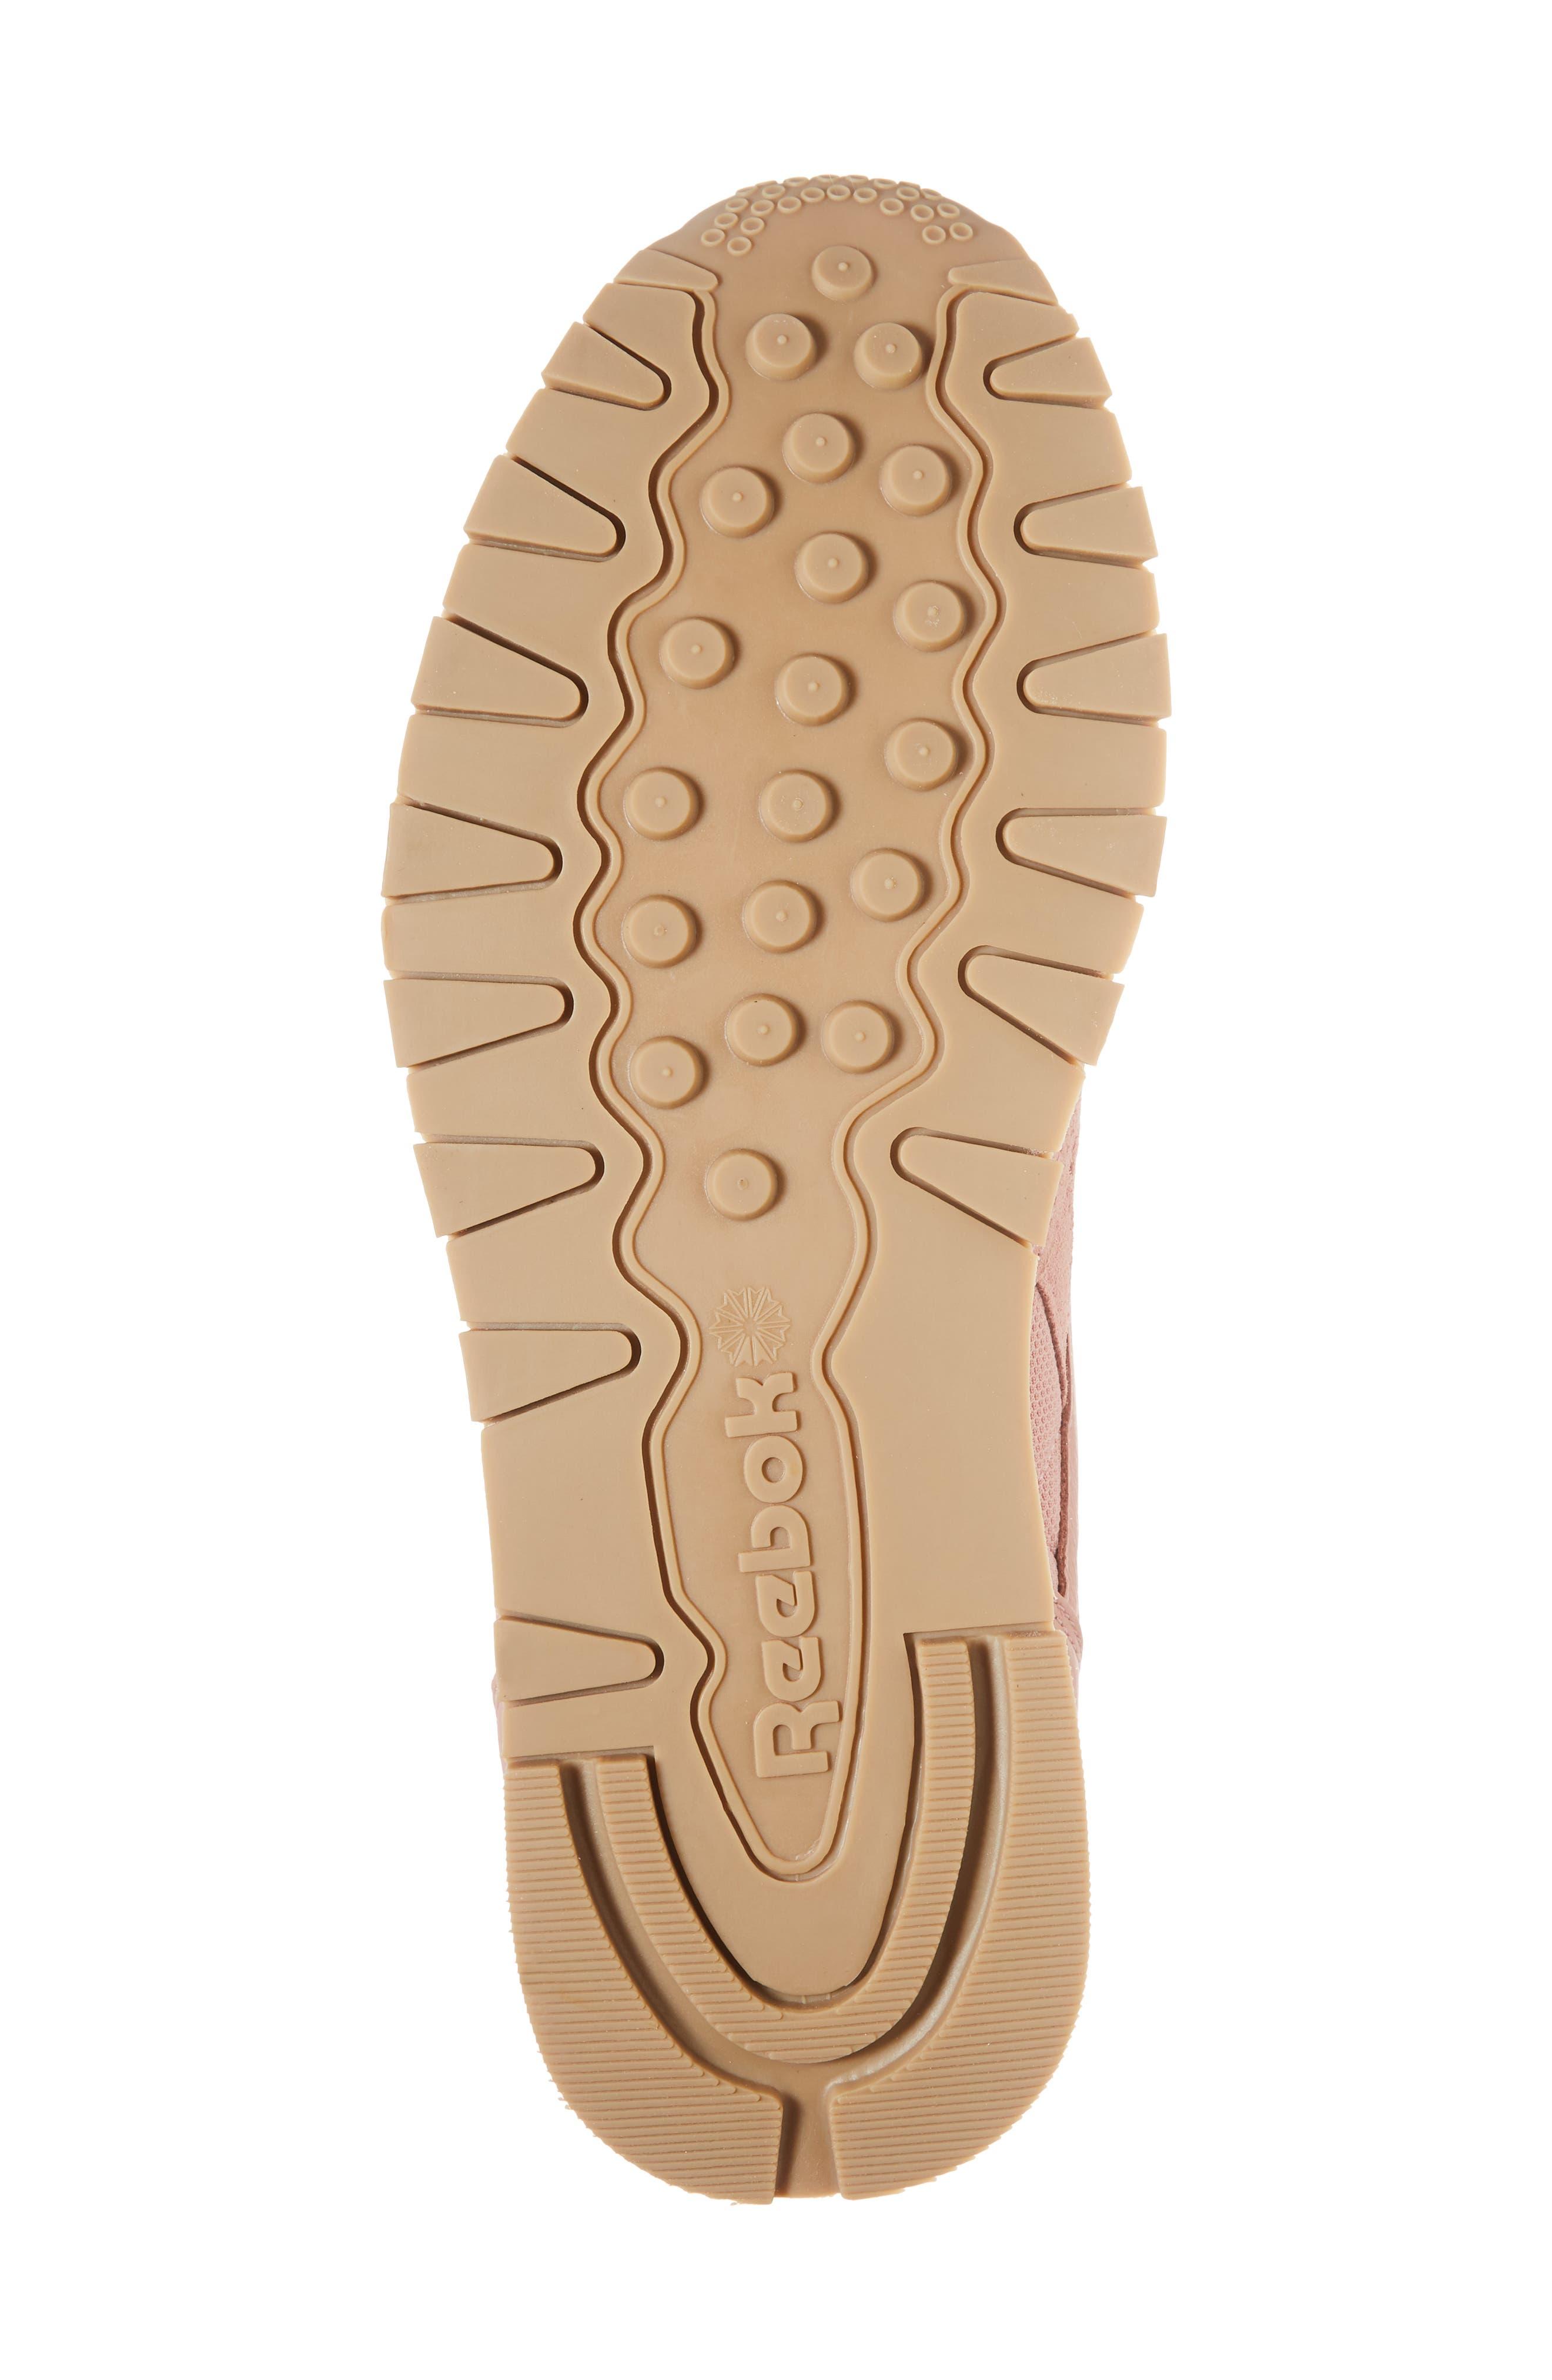 ESTL Classic Leather Sneaker,                             Alternate thumbnail 6, color,                             CHALK PINK/ WHITE